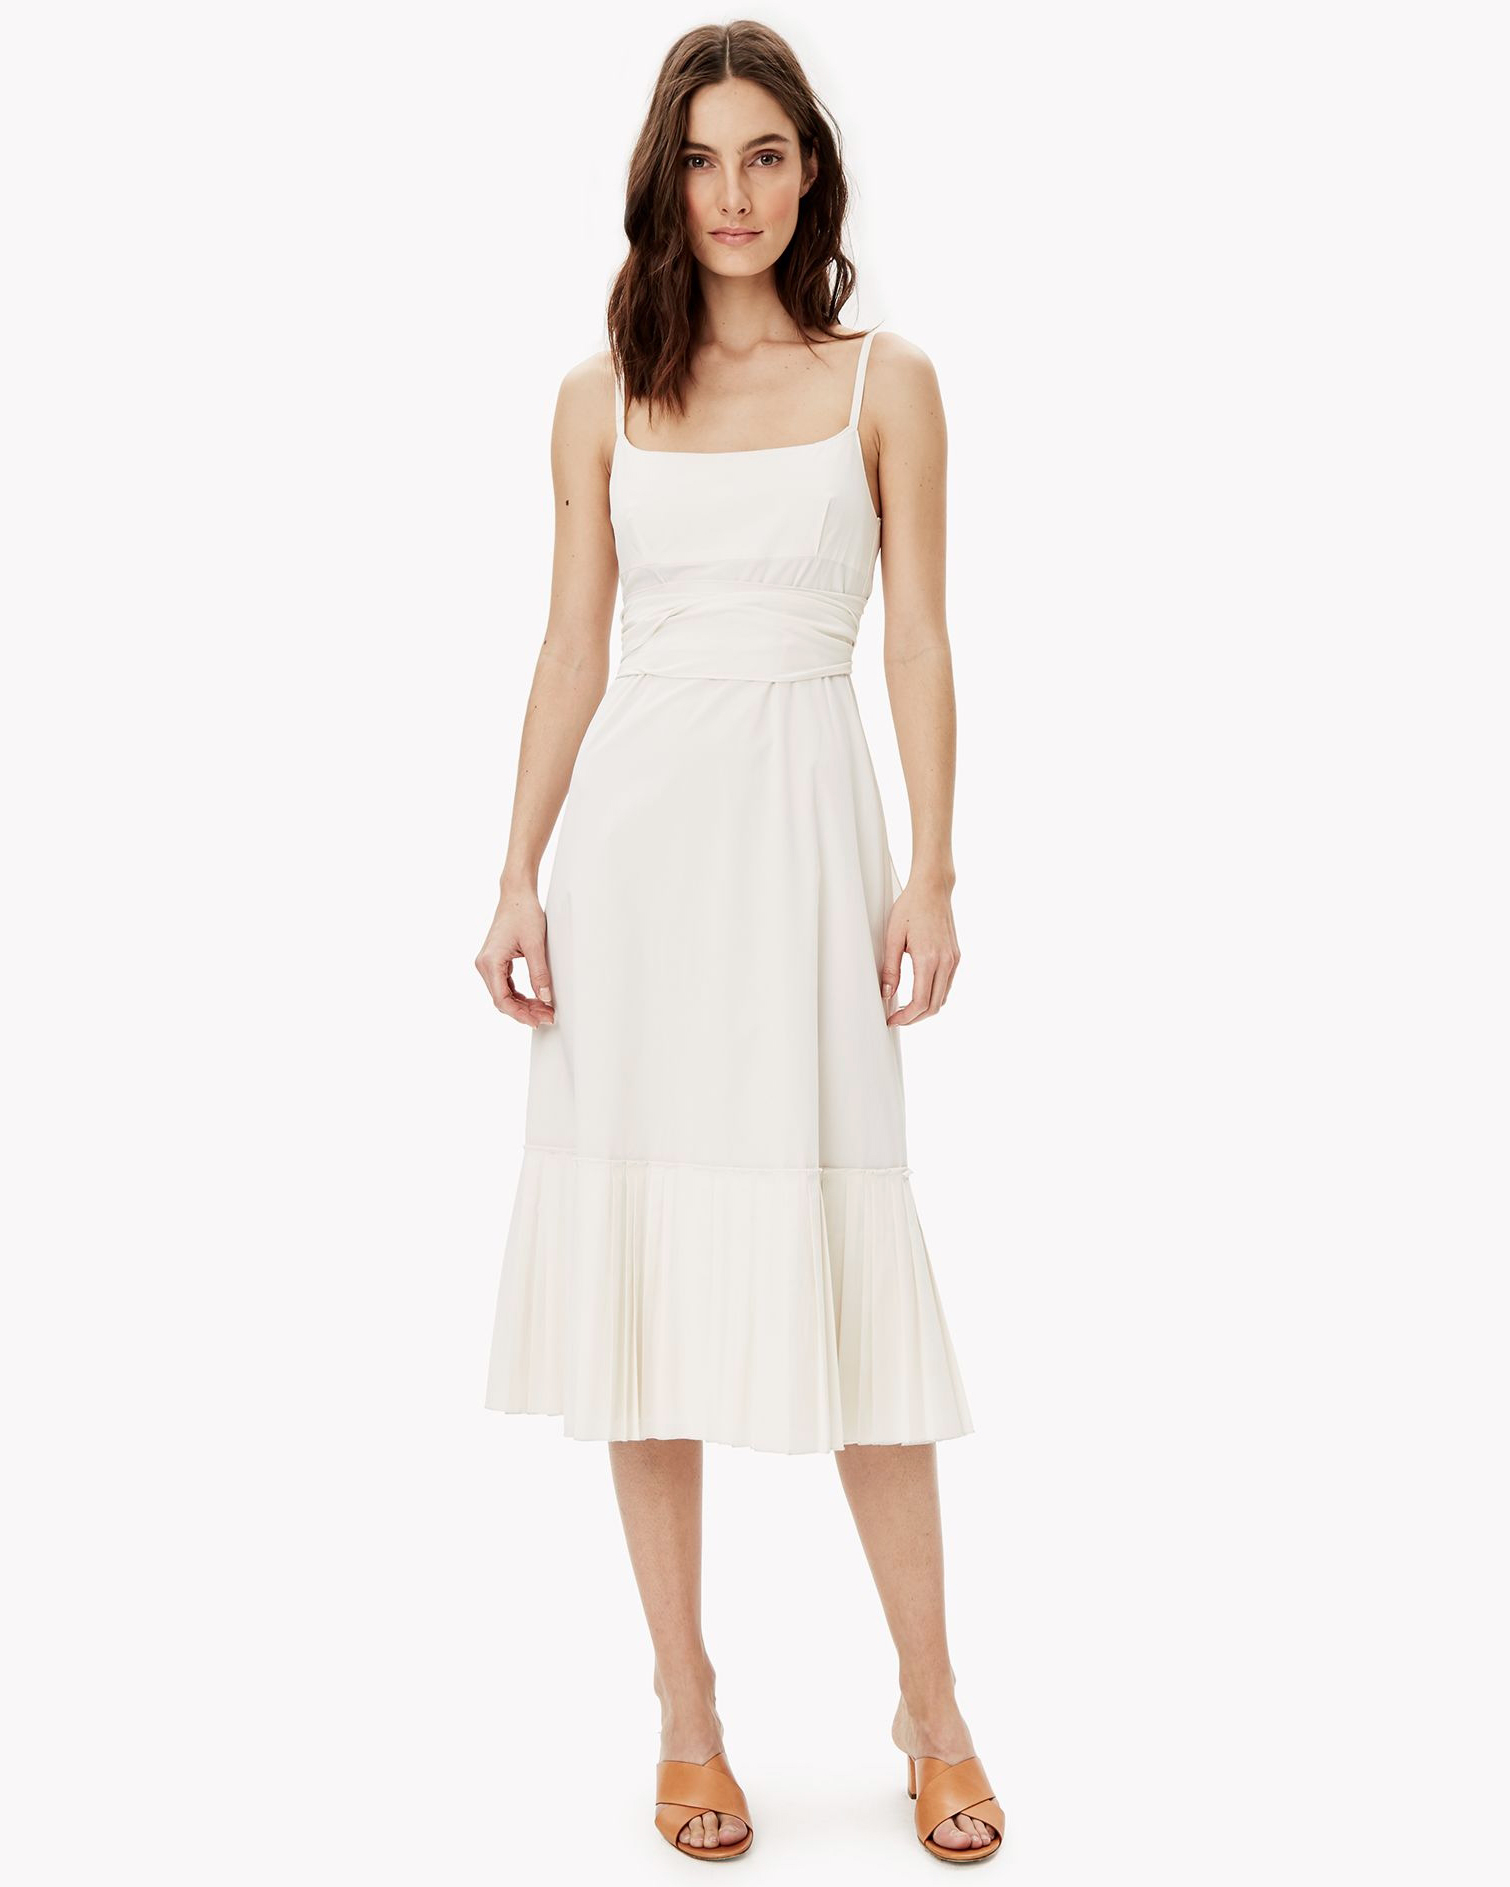 bachelorette-party-dress-theory-midi-dress.jpg